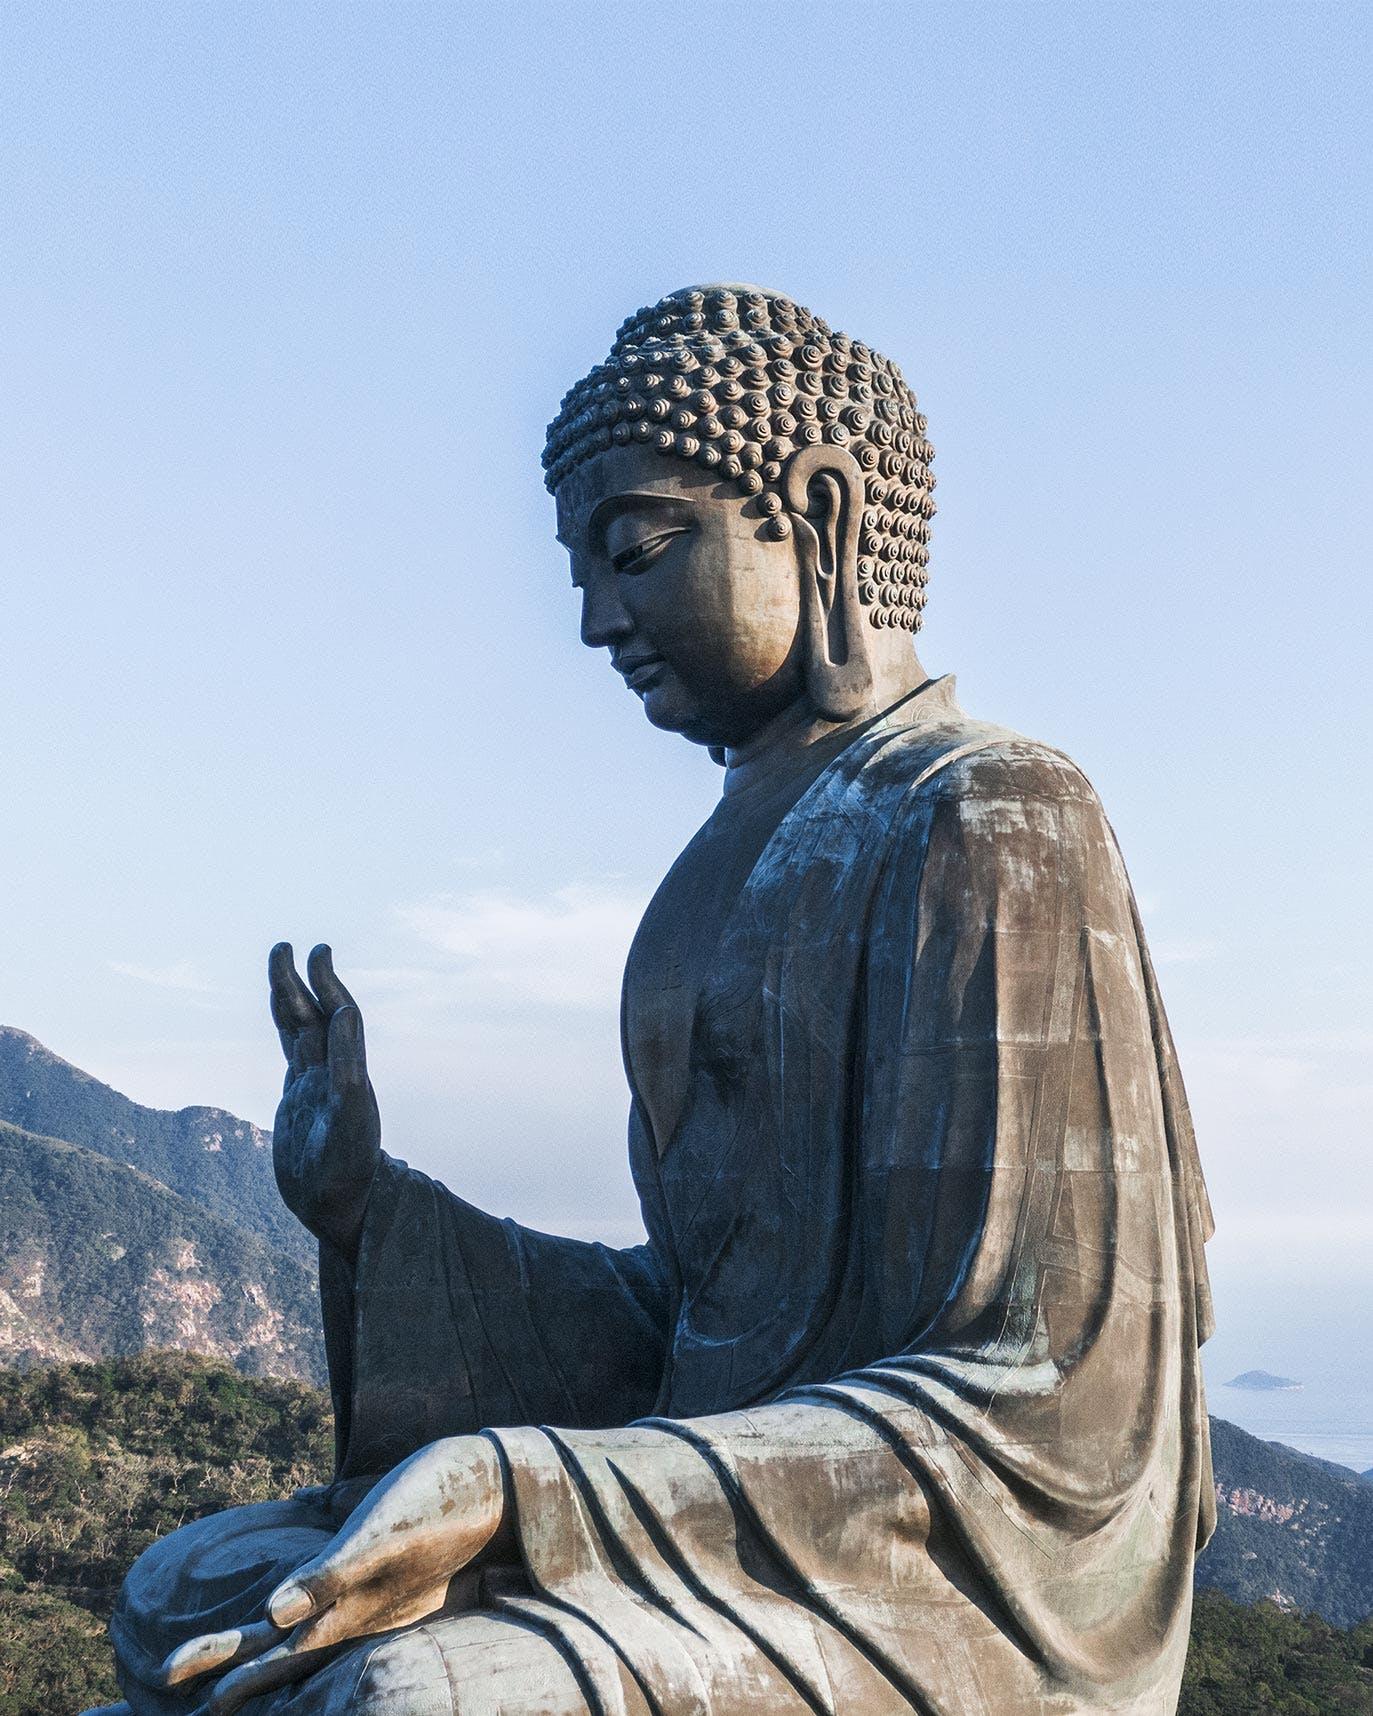 Side view of Tian Tan Buddha (Big Buddha)